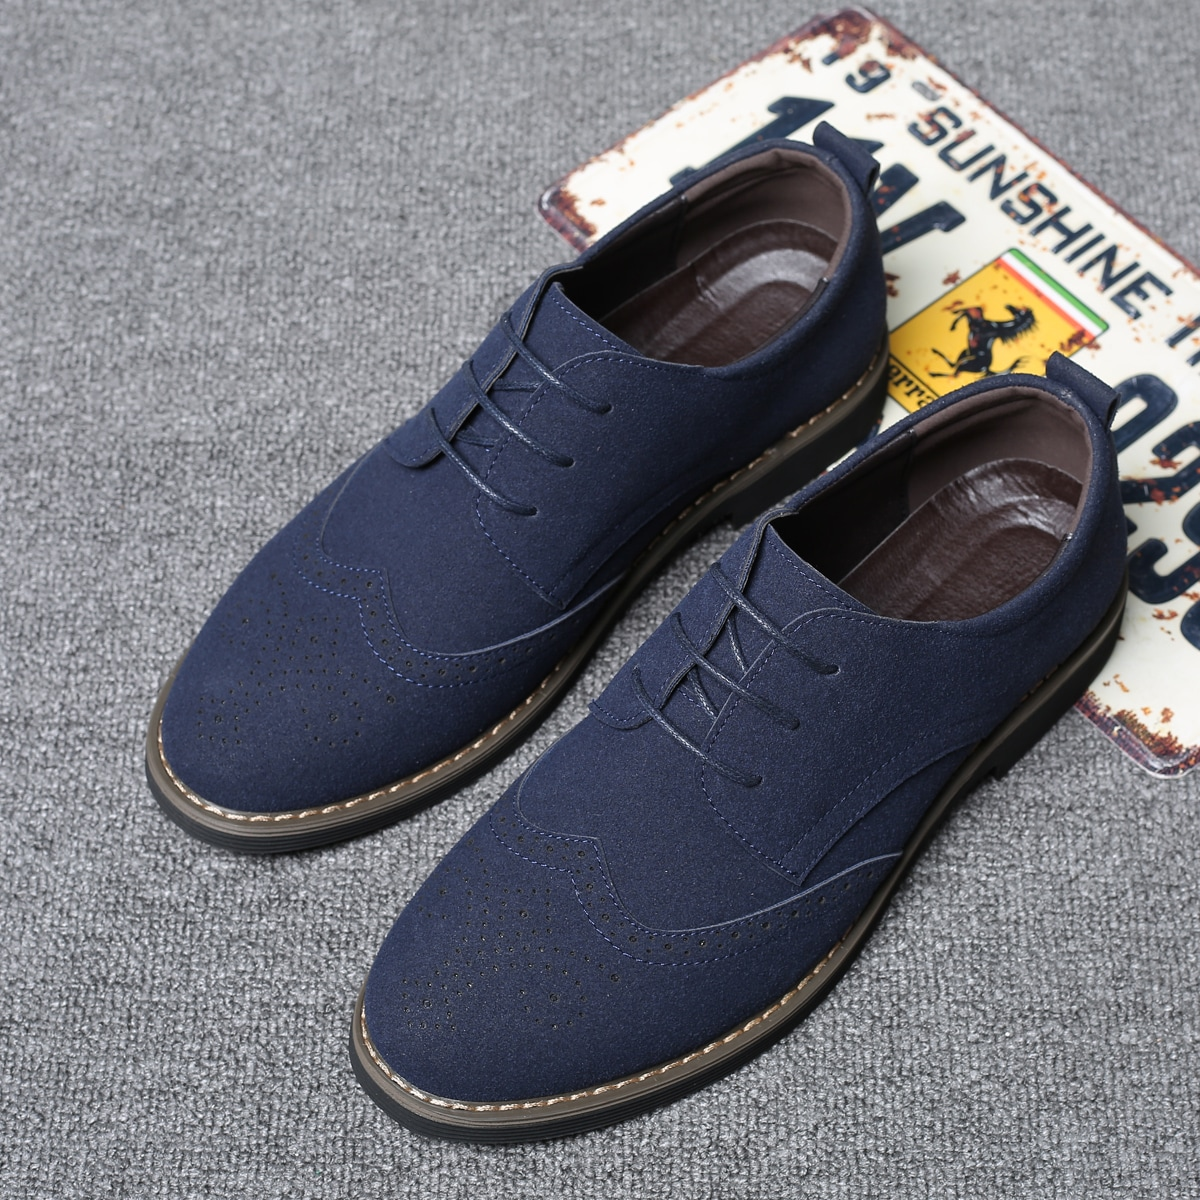 на шнурках Одноцветный Мужская официальная обувь по цене 2 340